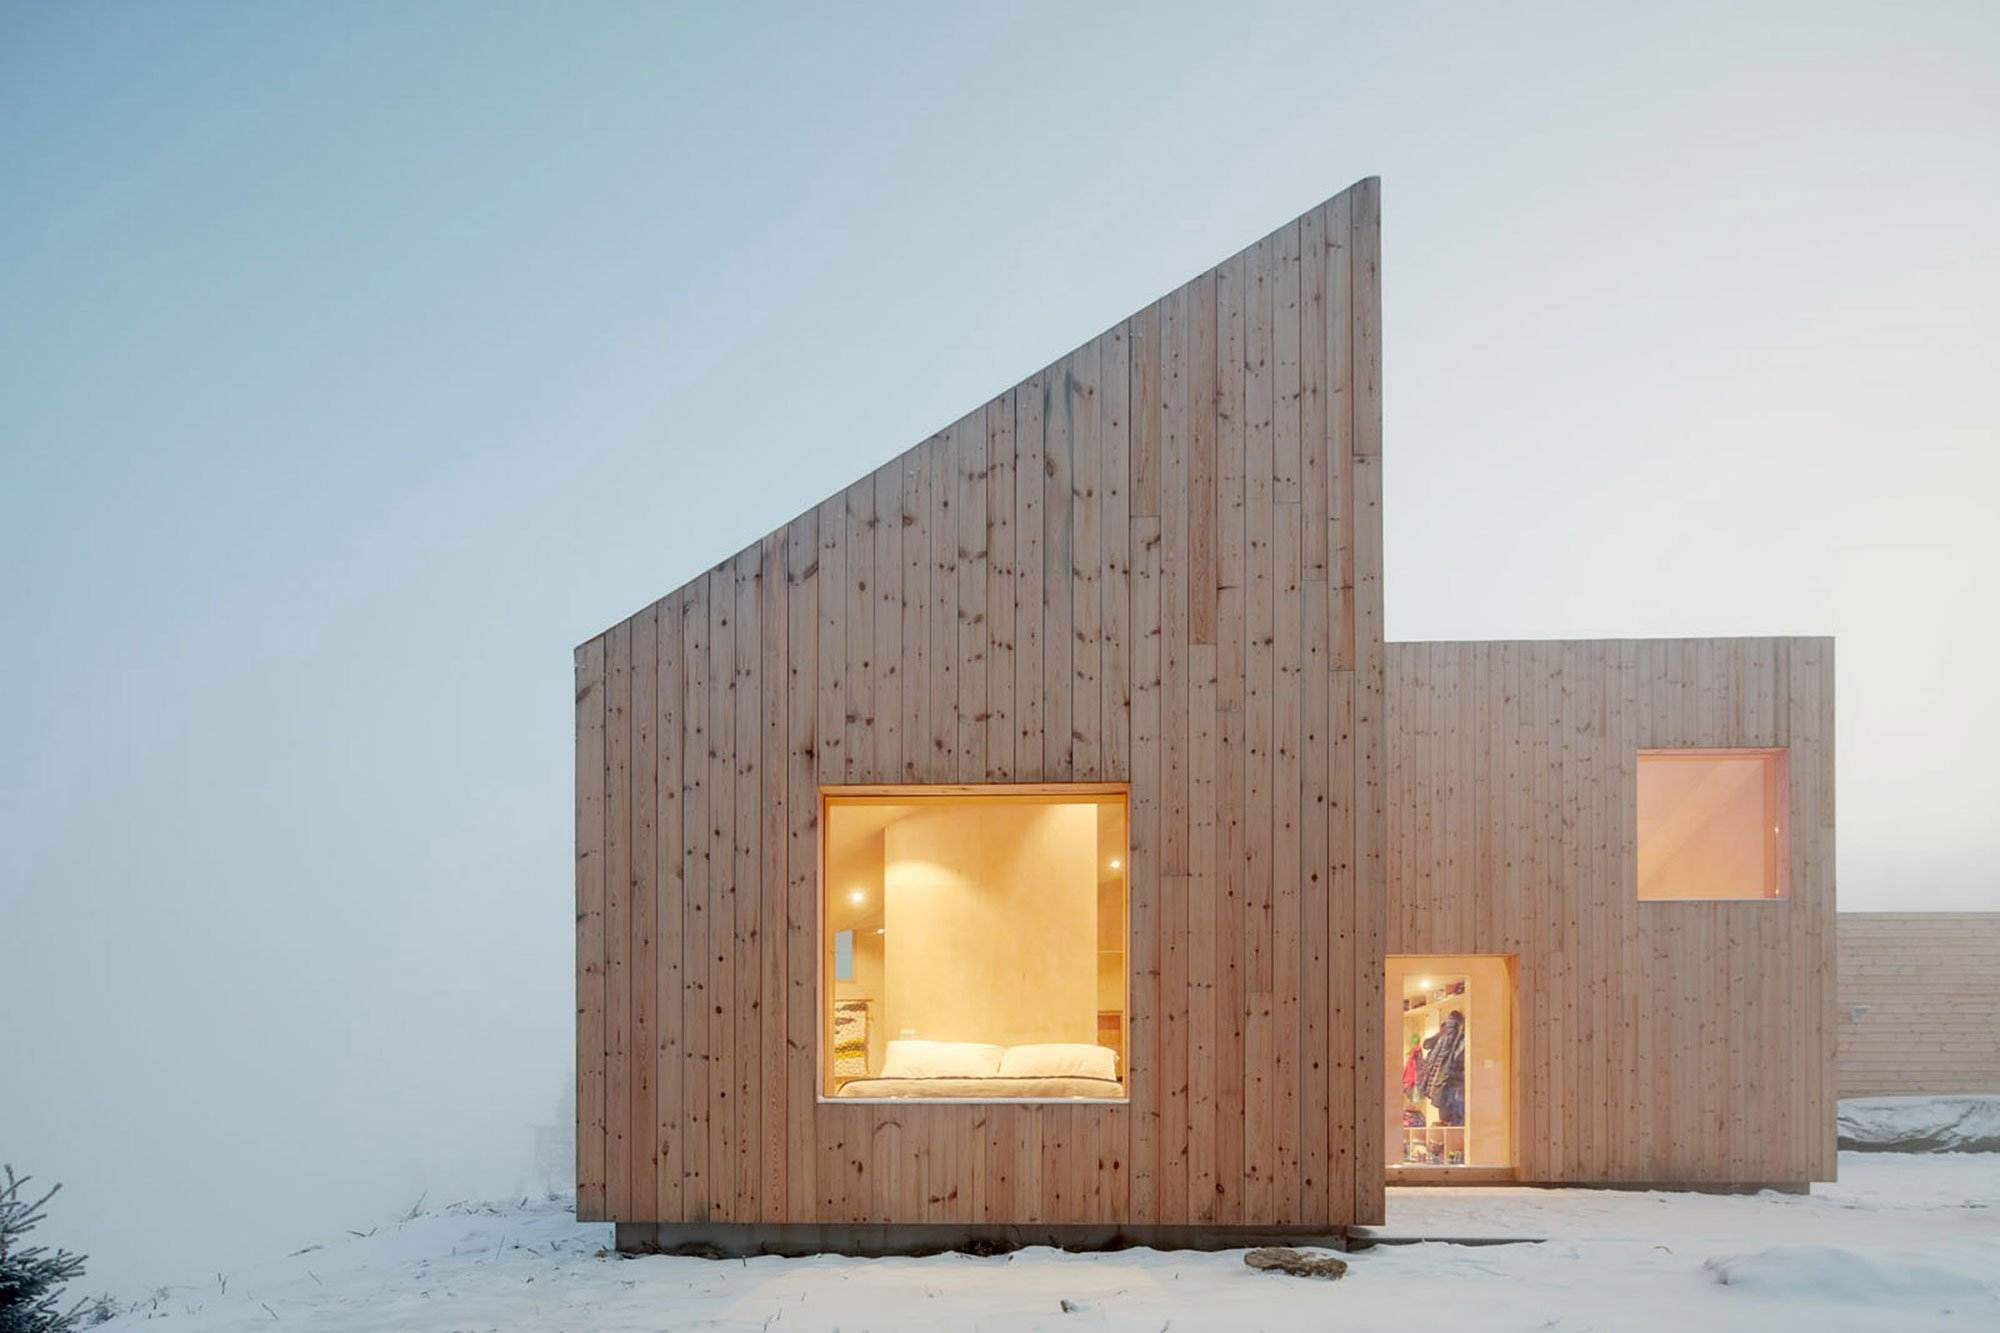 mylla-house-Mork-Ulnes Architects-Bruce-Damonte-01